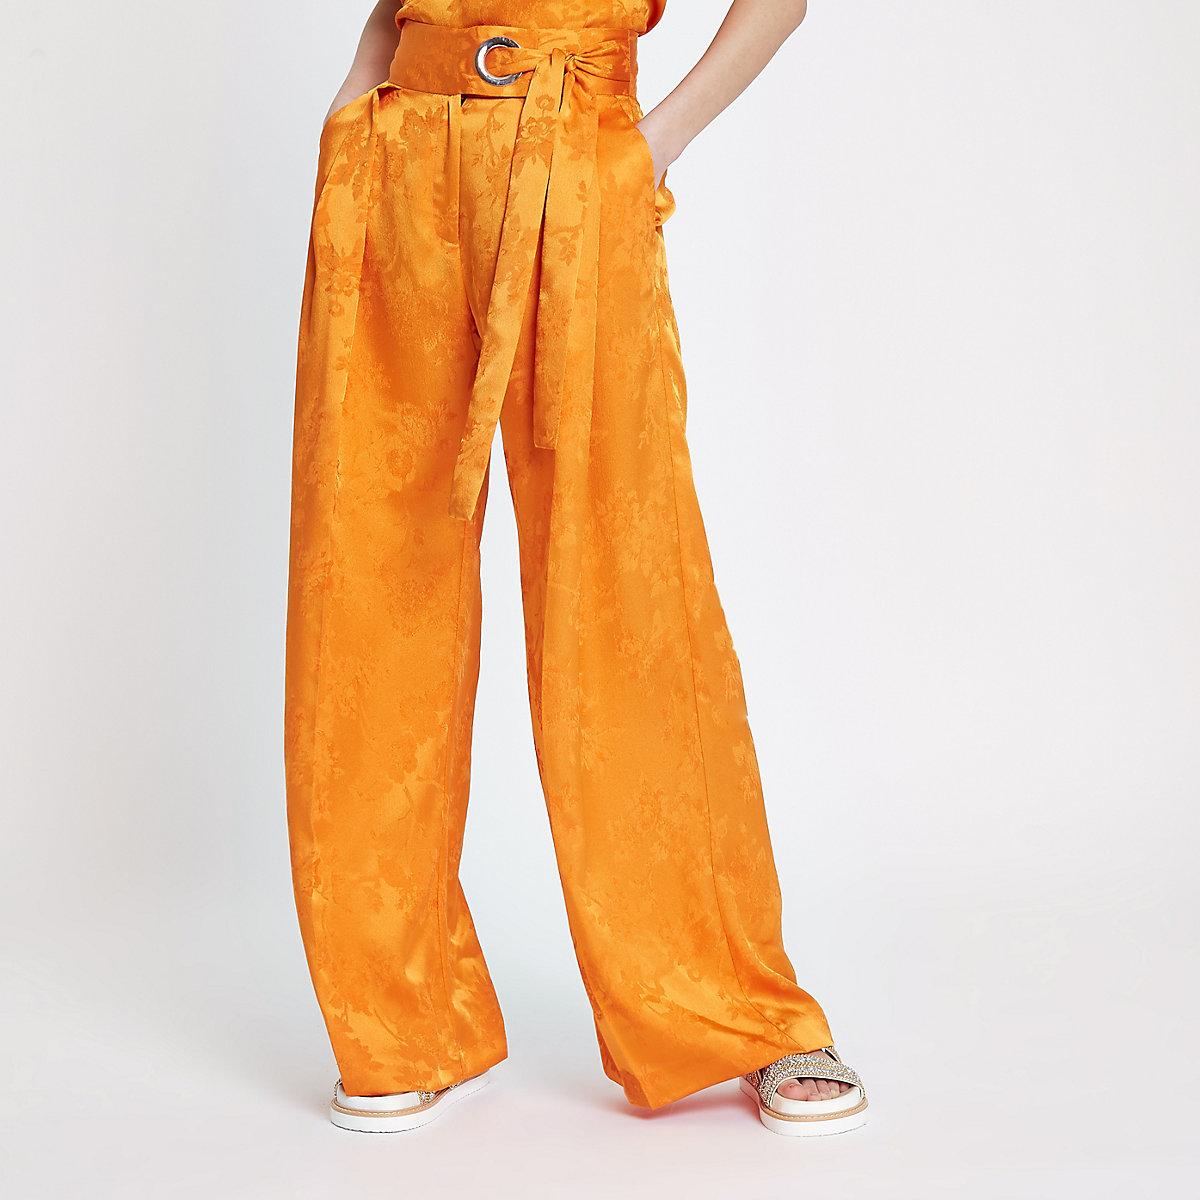 Orange jacquard wide leg pants